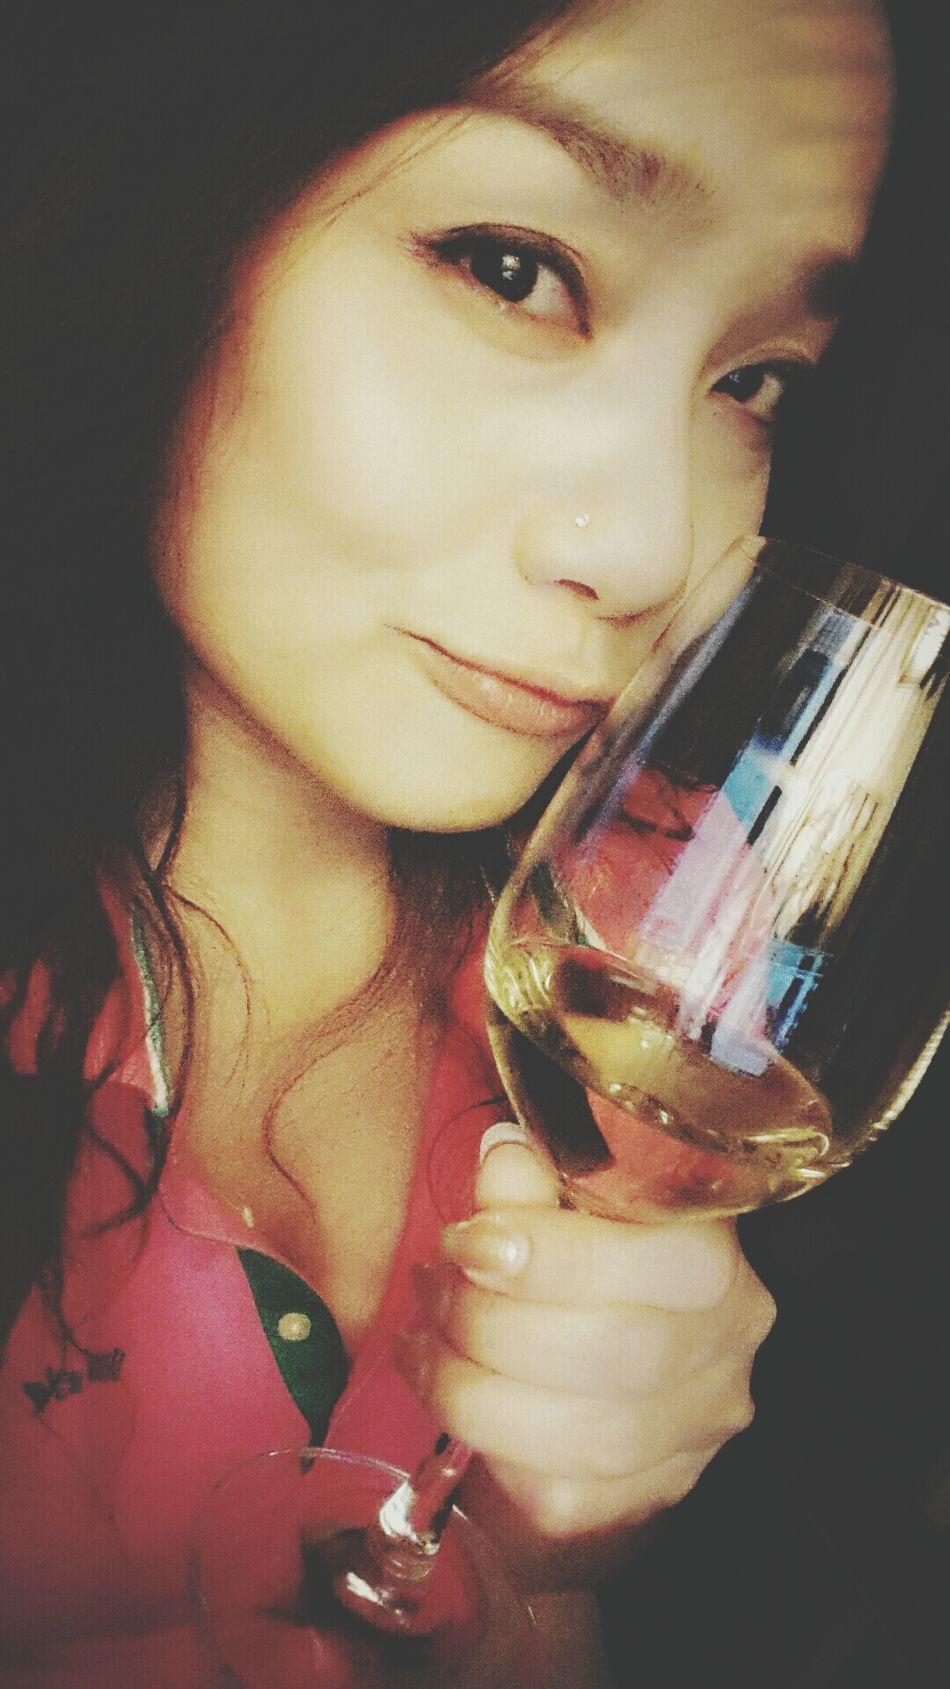 Hello World It's Me and my wine... Enjoying Life Gettin Tipsy lol :)